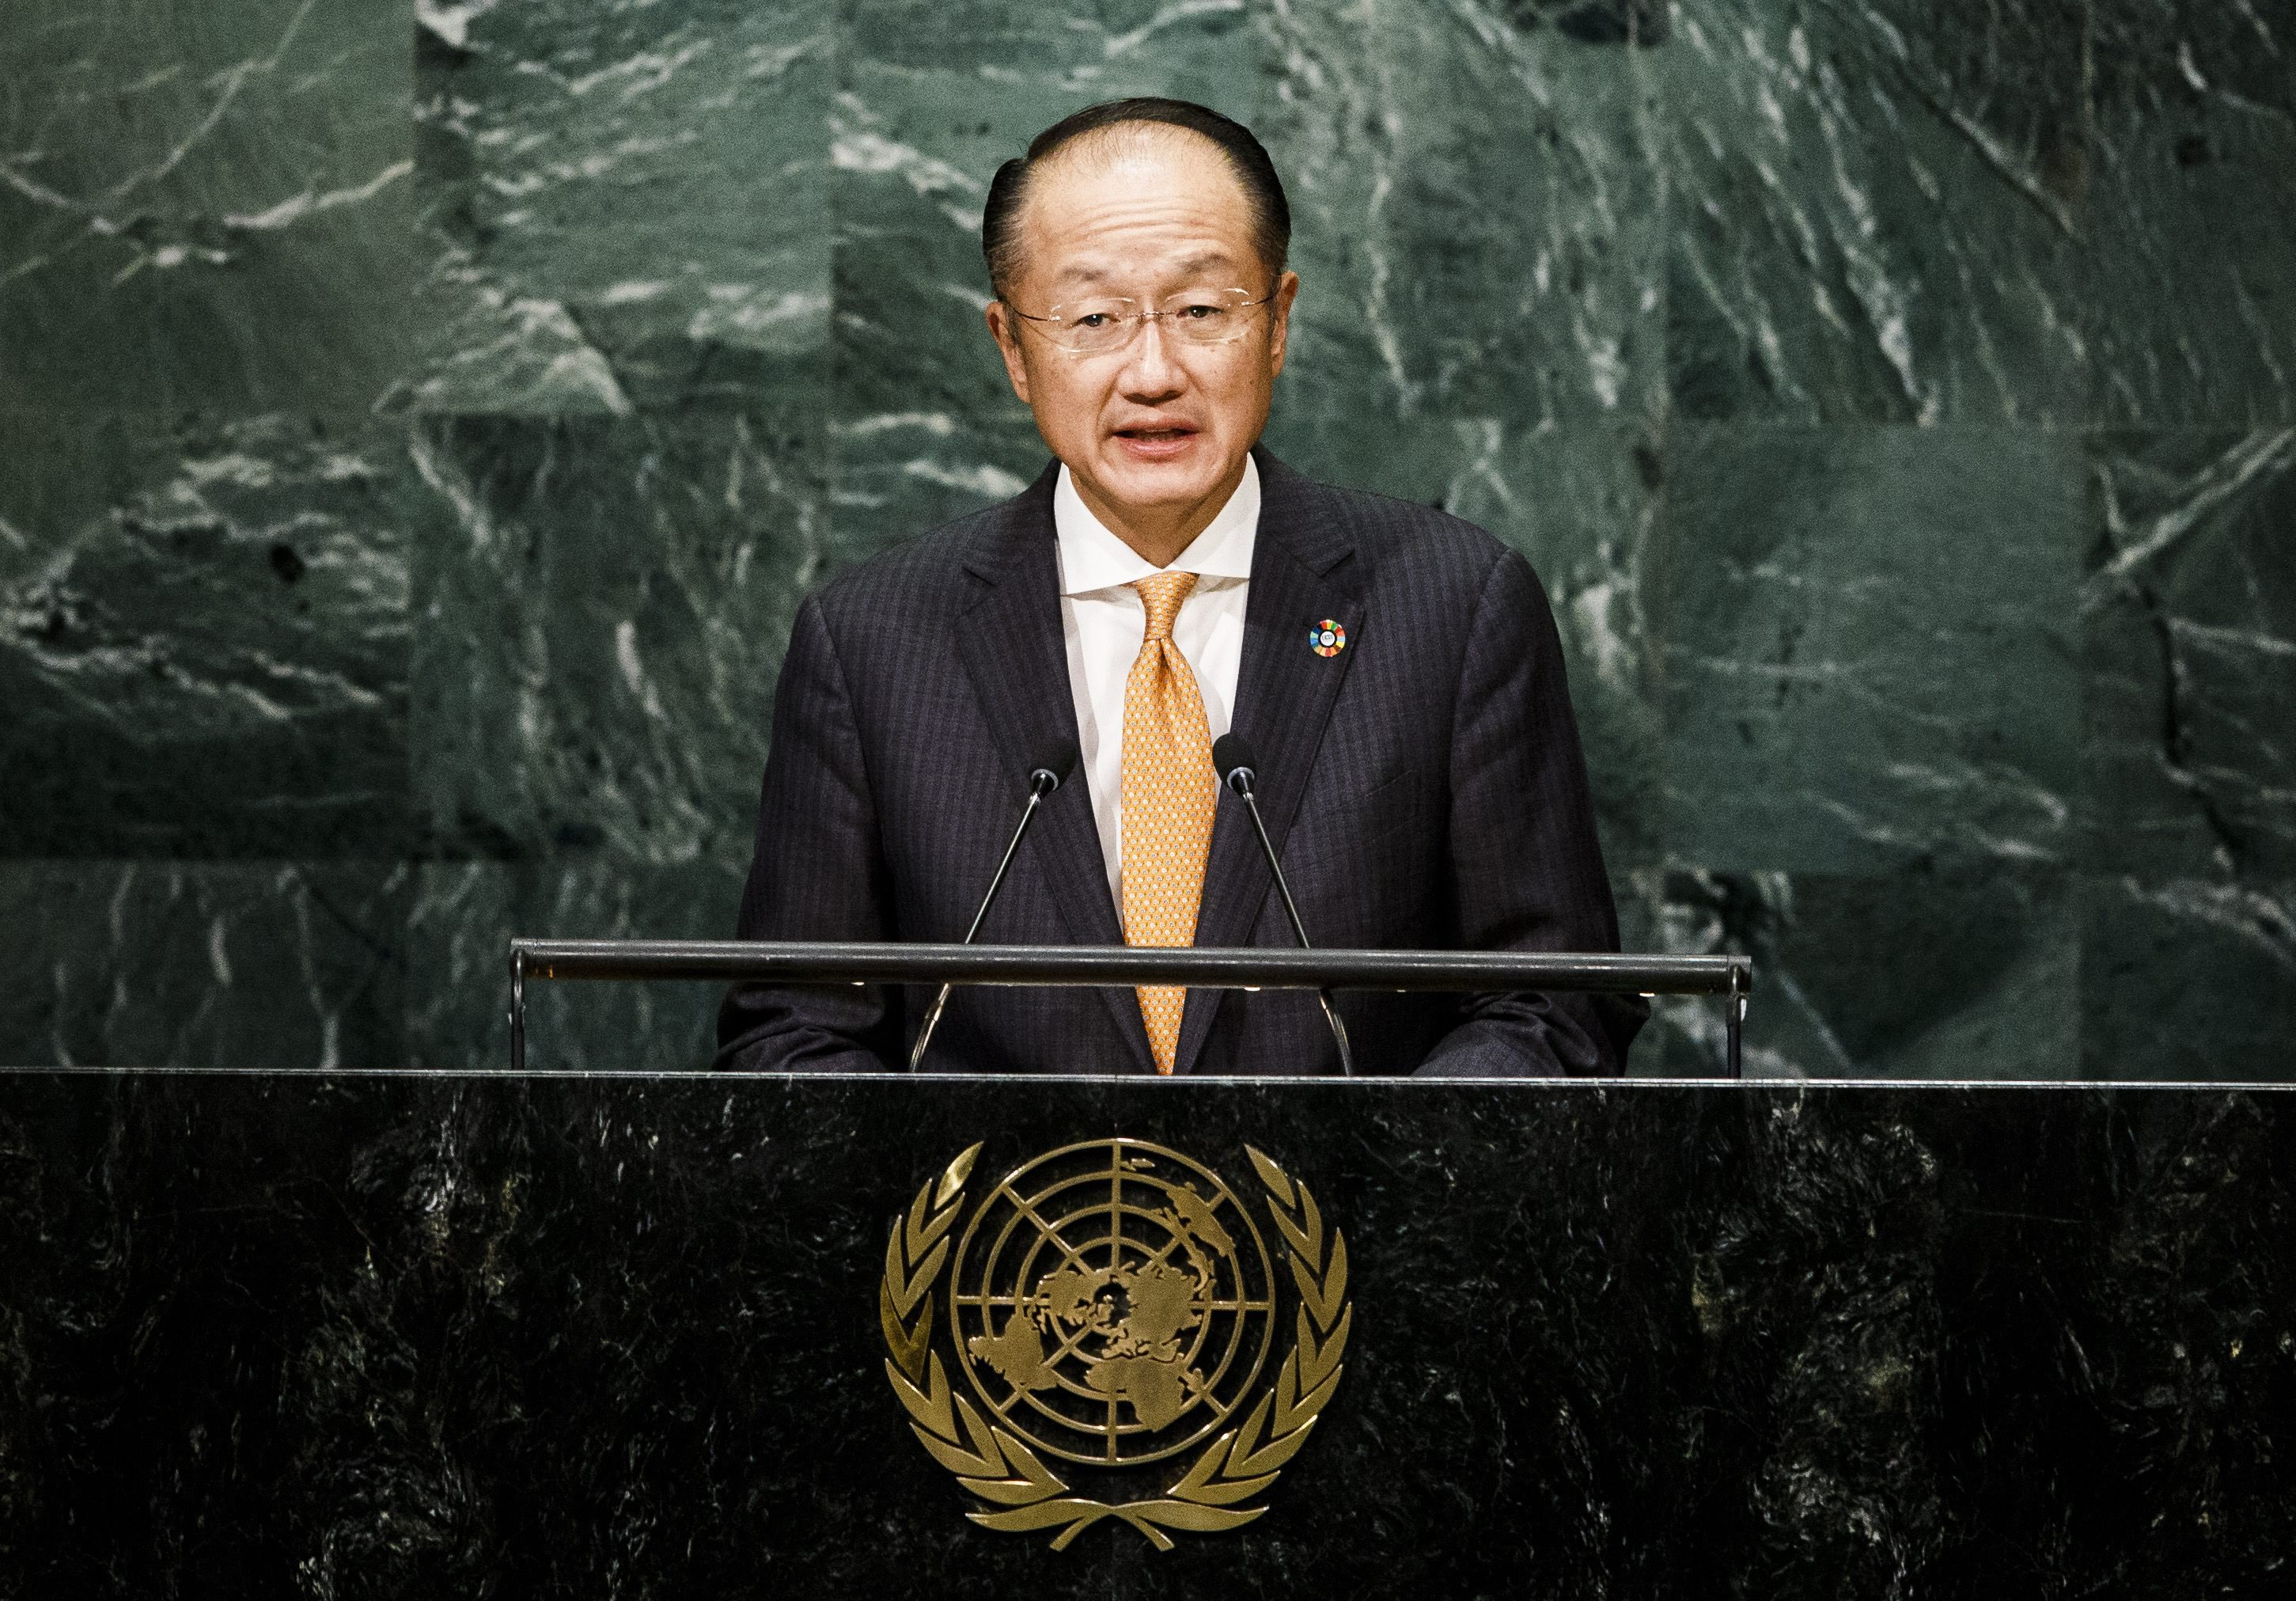 Norte-americano Jim Yong Kim reconduzido como presidente do Banco Mundial